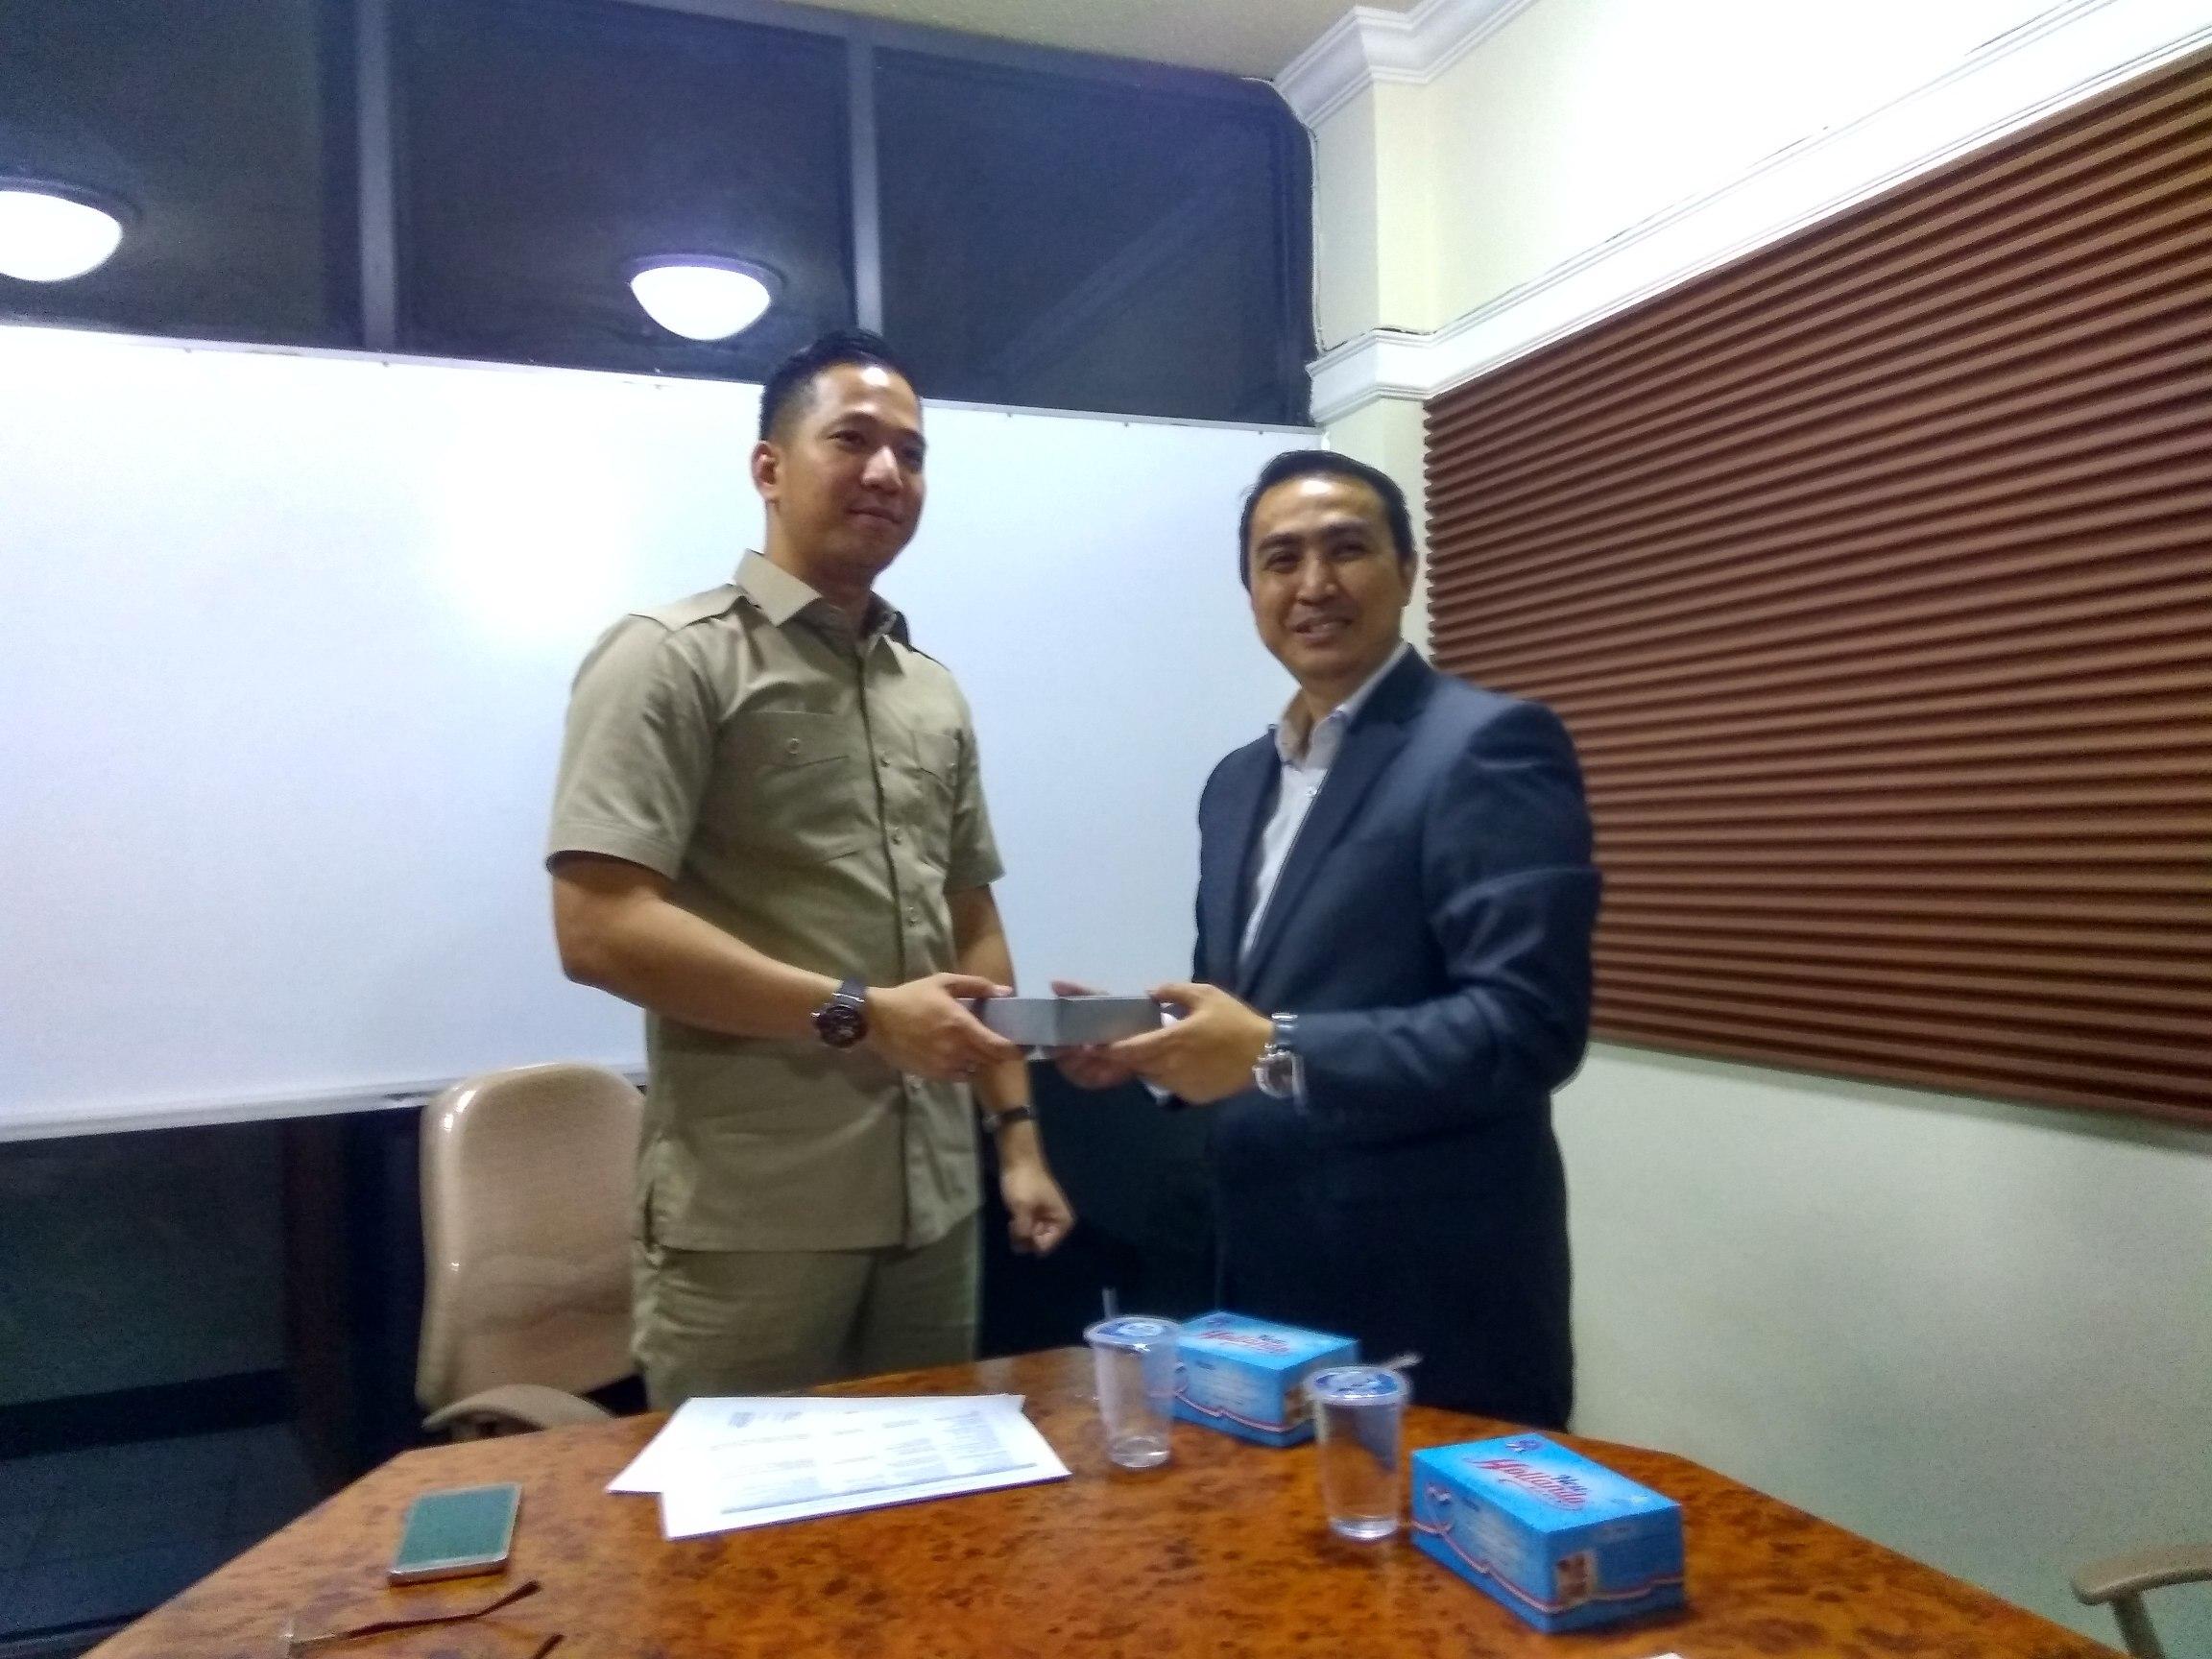 Kunjungan MATRADE Malaysia Membangun Relasi dengan Kadin Provinsi Sumatera Selatan